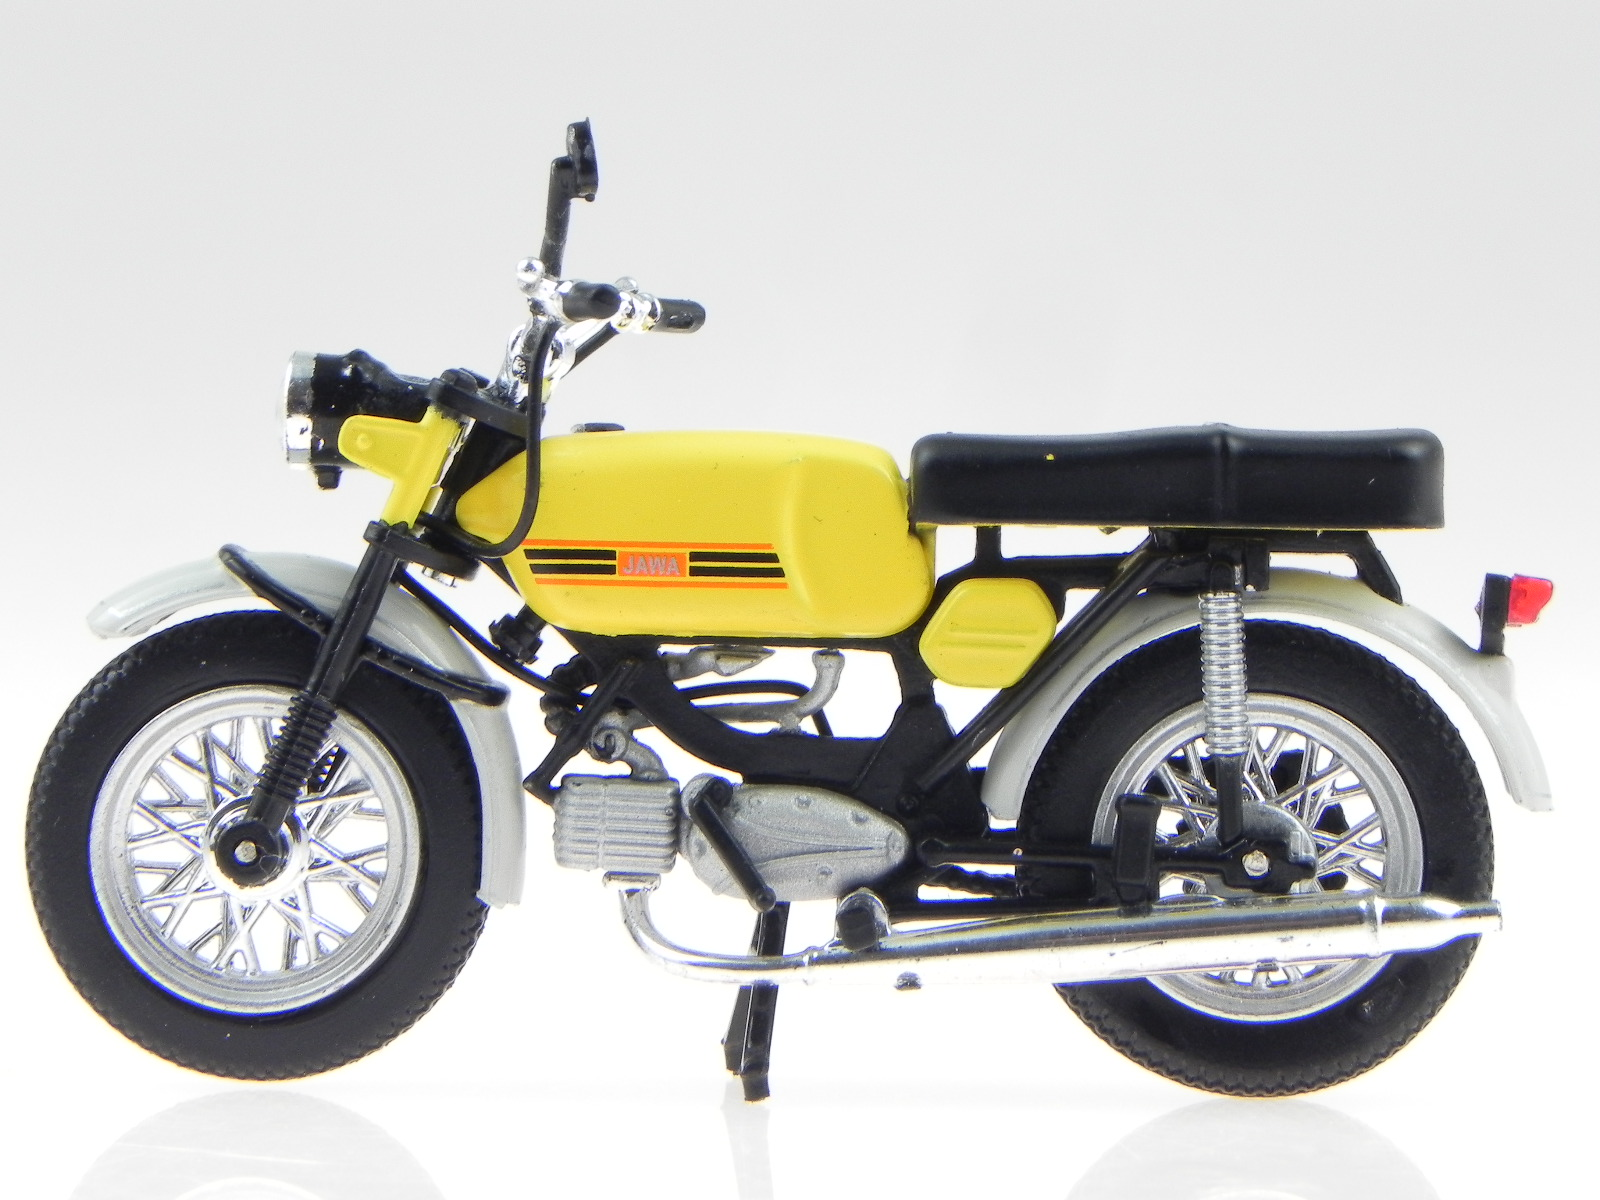 jawa type 23 mustang ddr ostalgie motorrad modell atlas 1. Black Bedroom Furniture Sets. Home Design Ideas